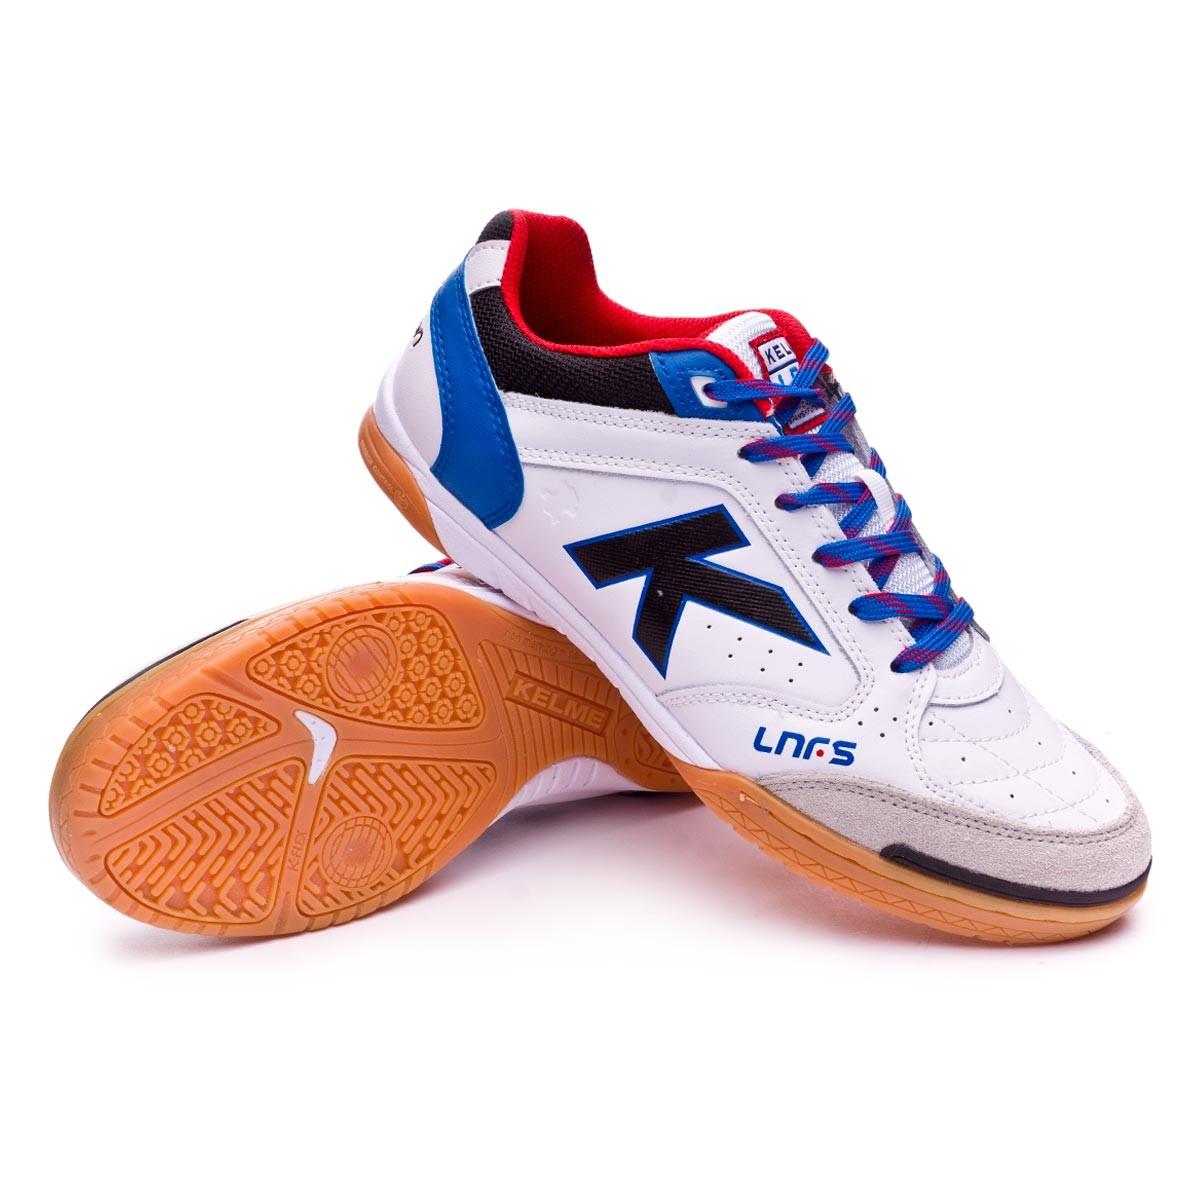 61d7b9492 Futsal Boot Kelme Precision LNFS Leather White - Football store Fútbol  Emotion